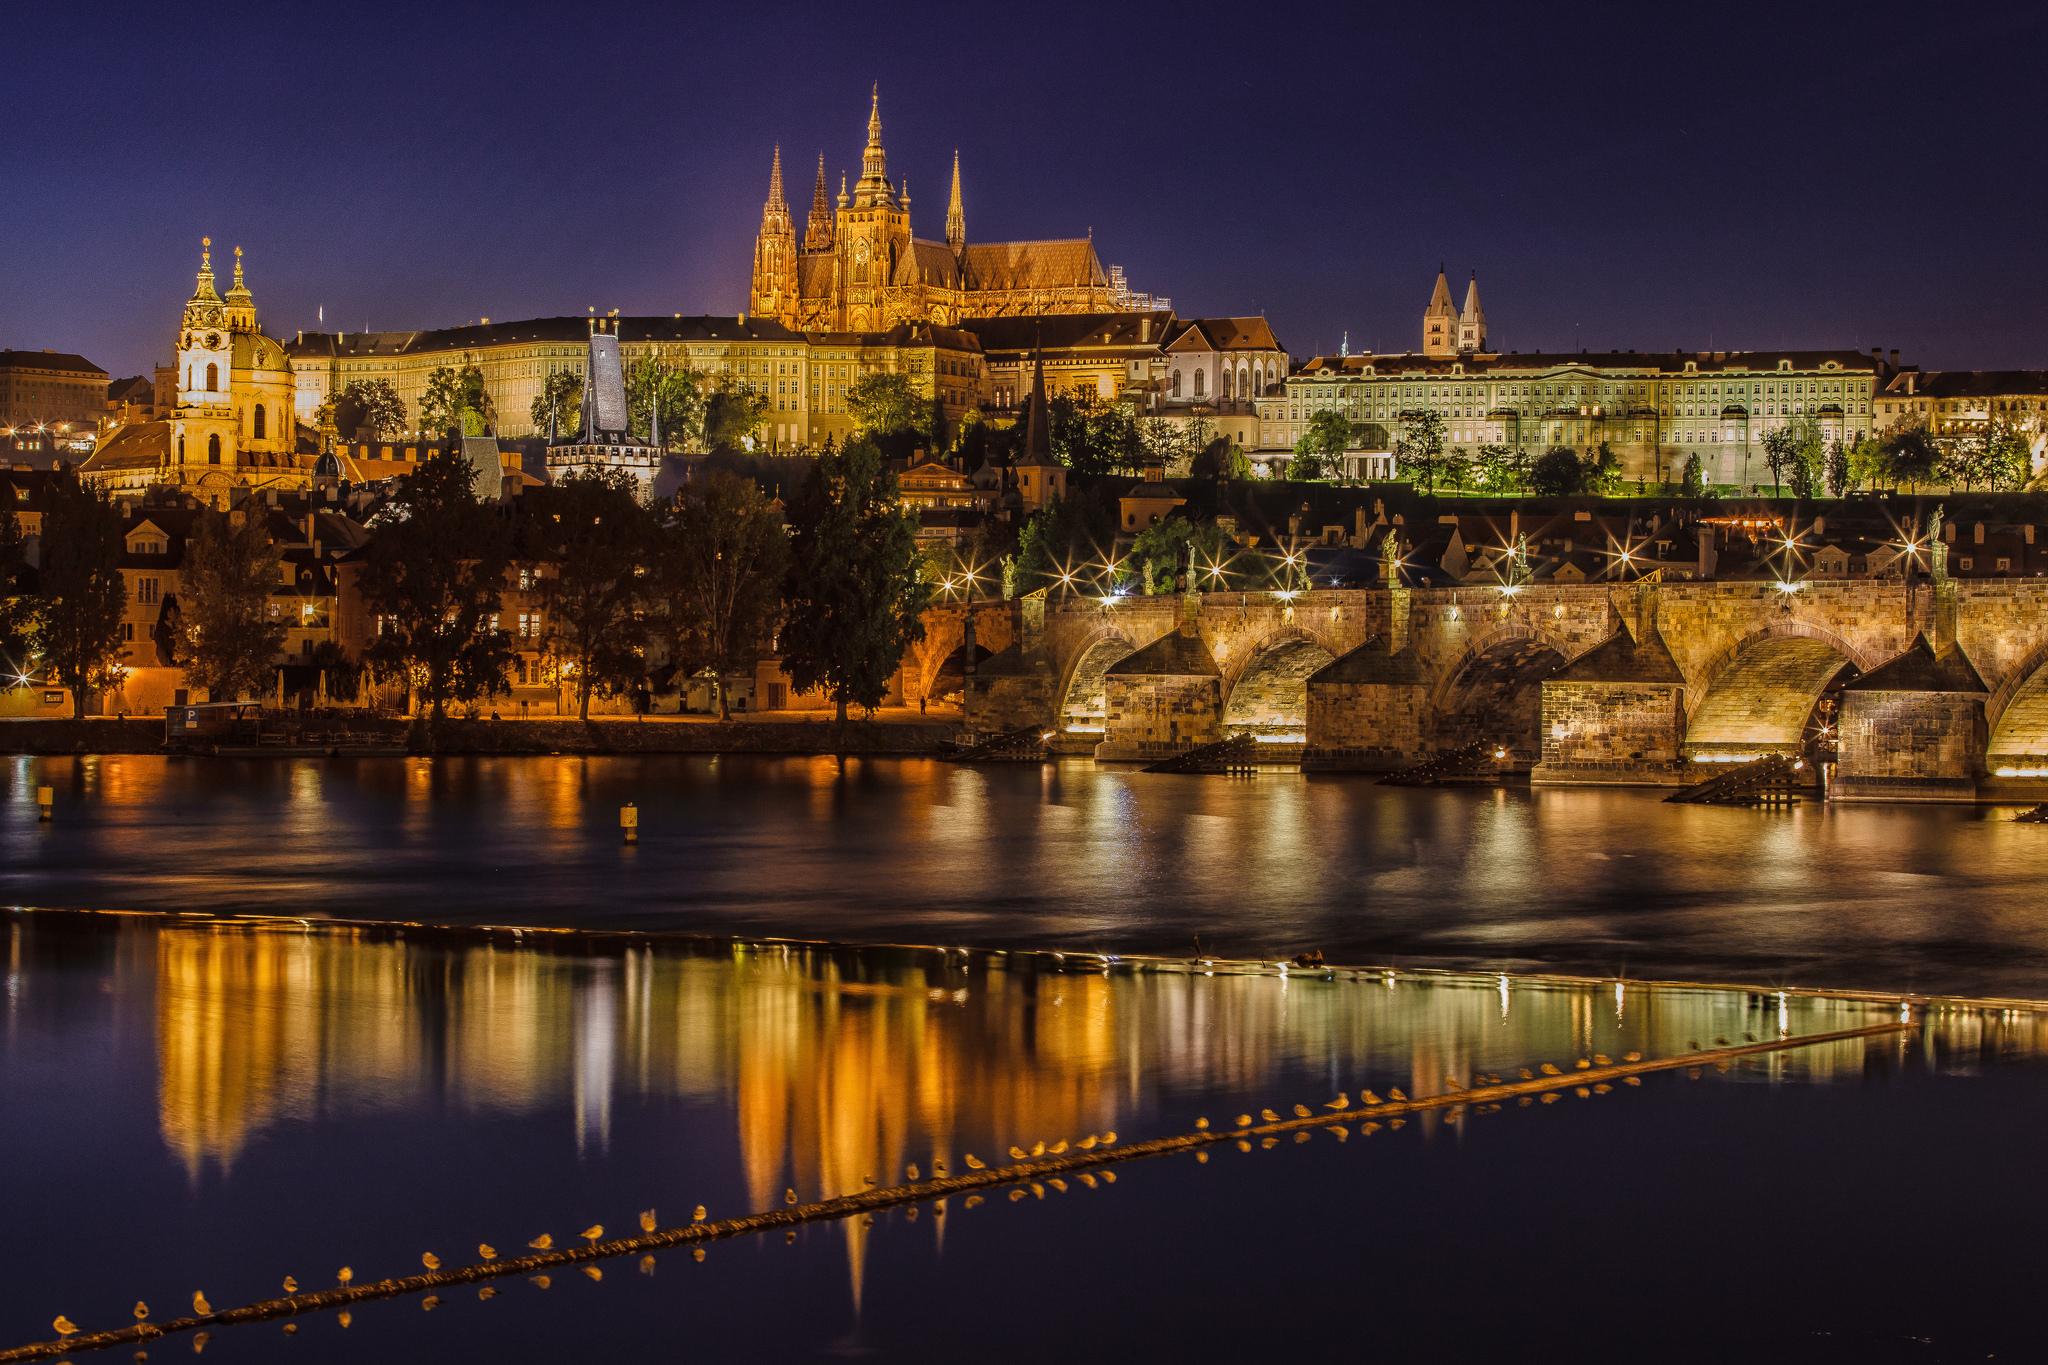 Prague-city-night-Vltava-river-medieval-palace-beauty.jpg